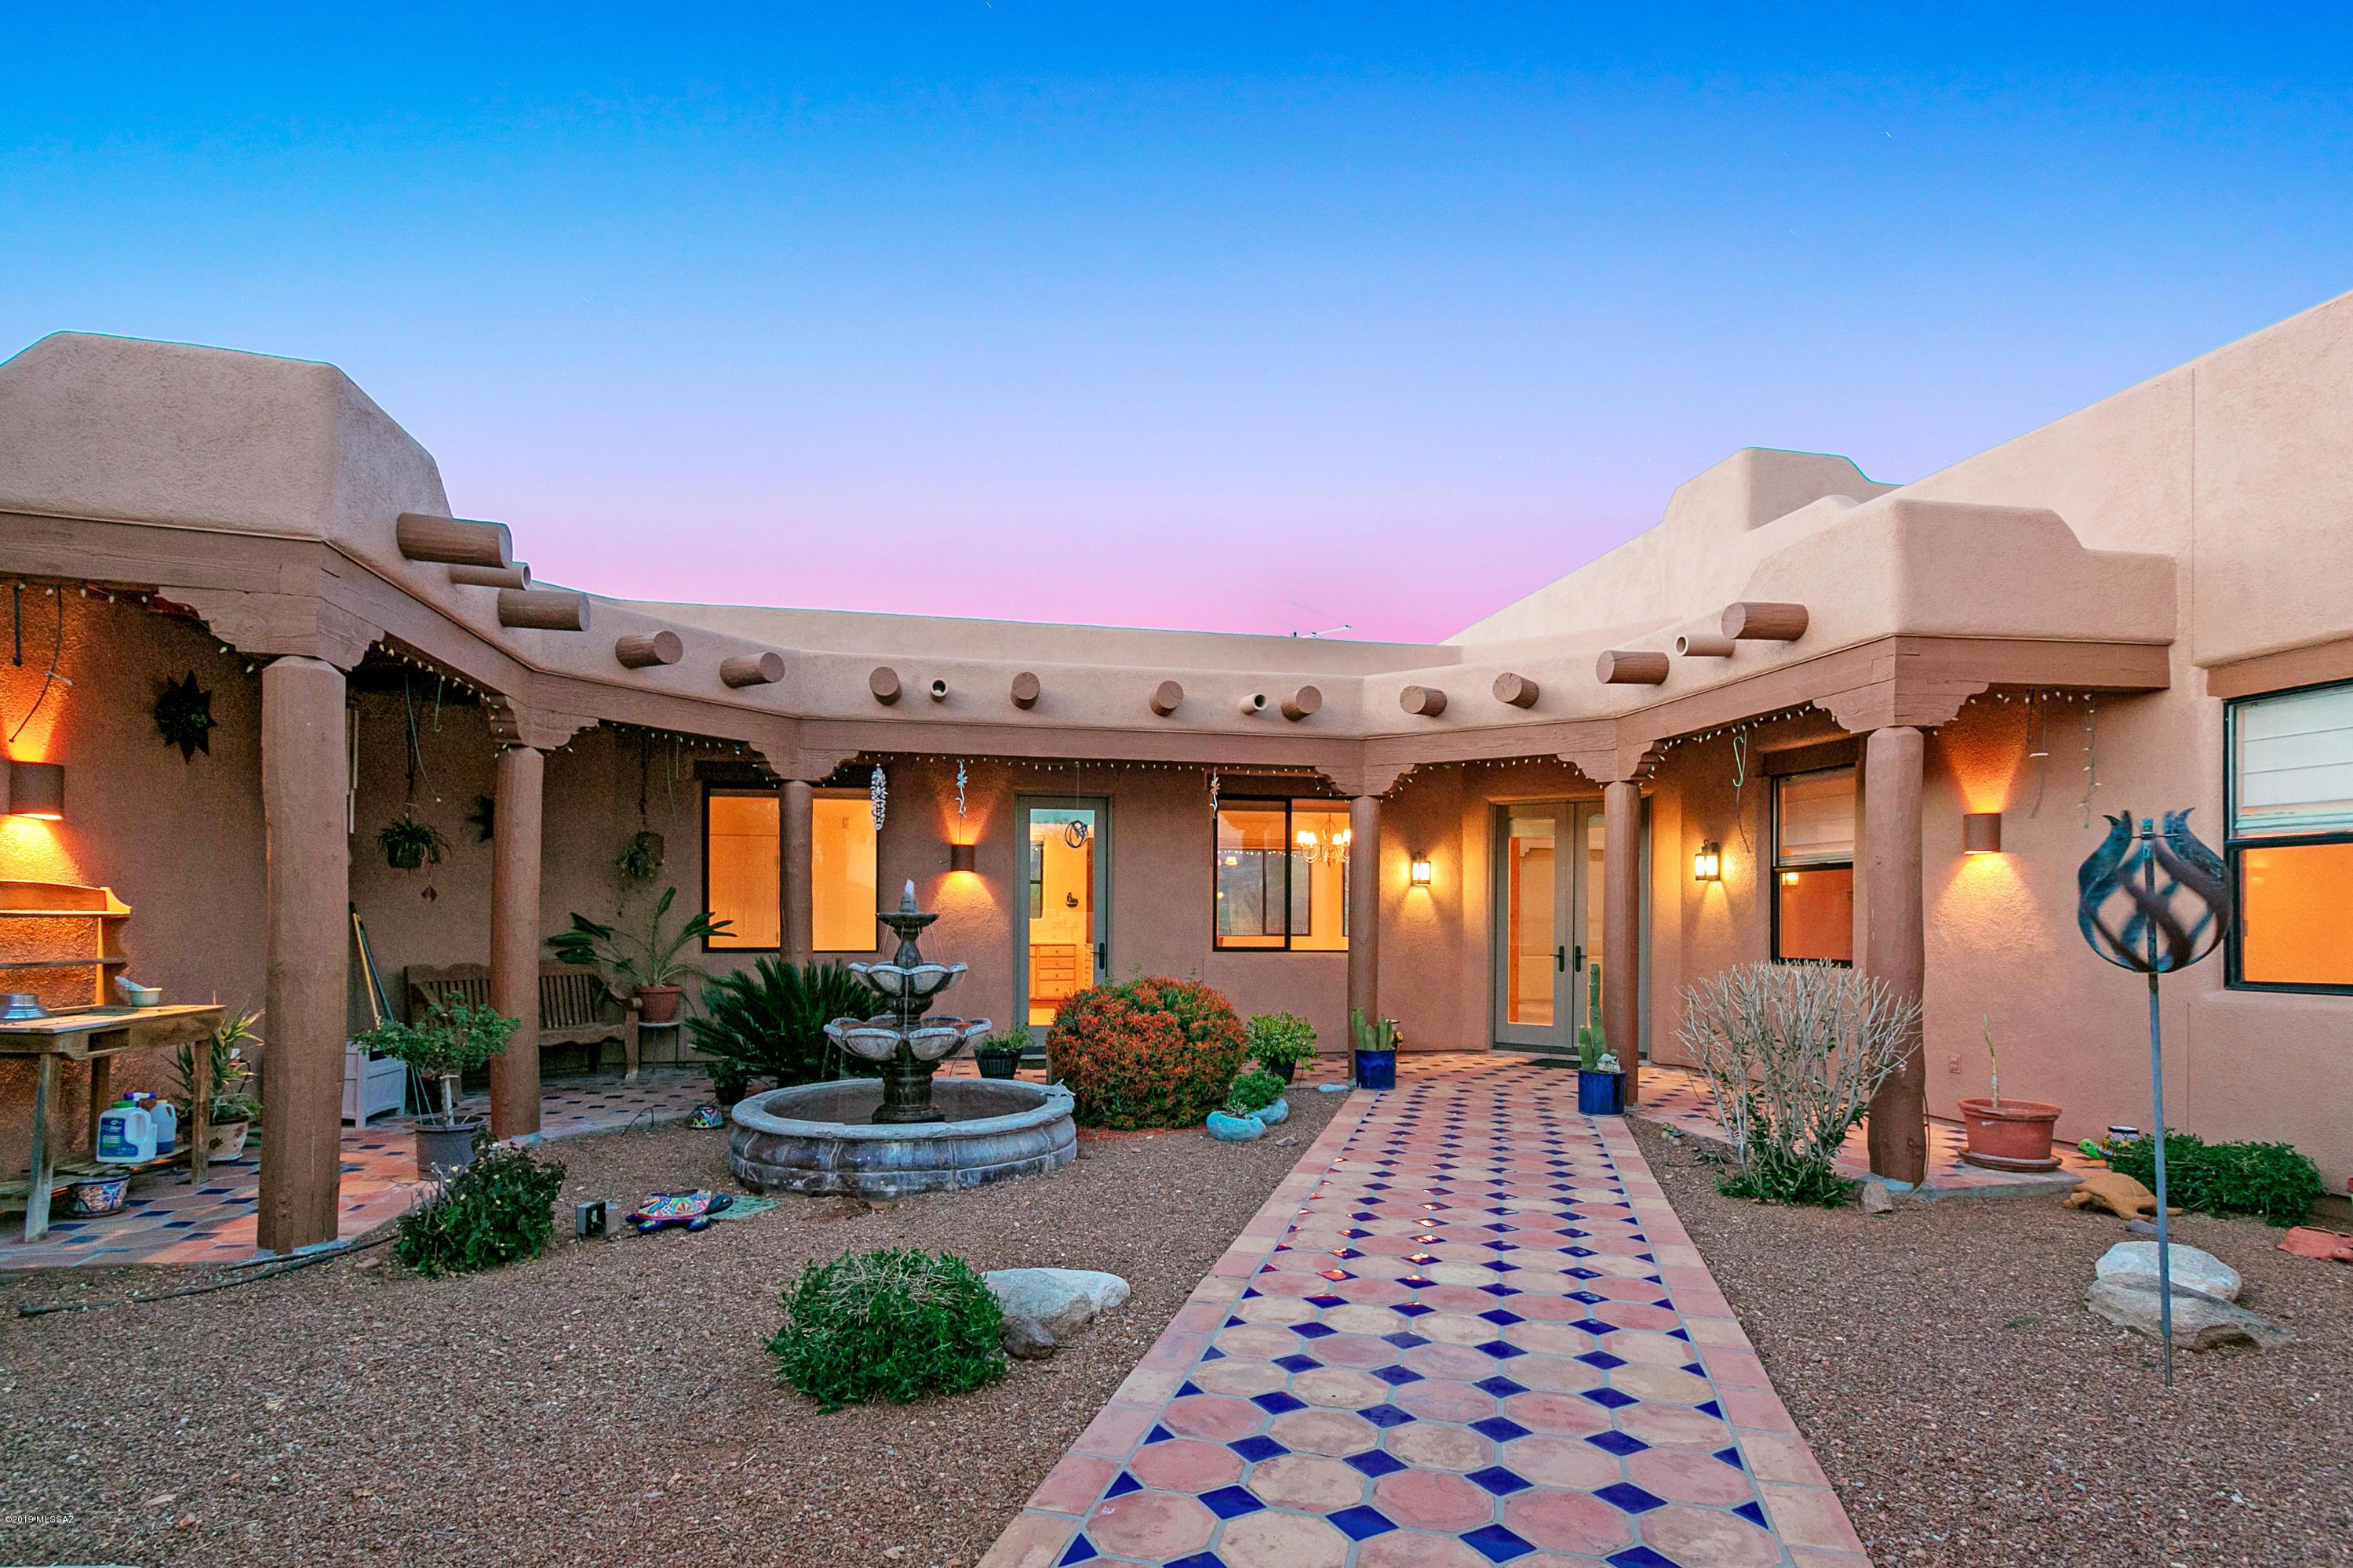 Photo of 7002 S Avenida Del Potrillo, Tucson, AZ 85747